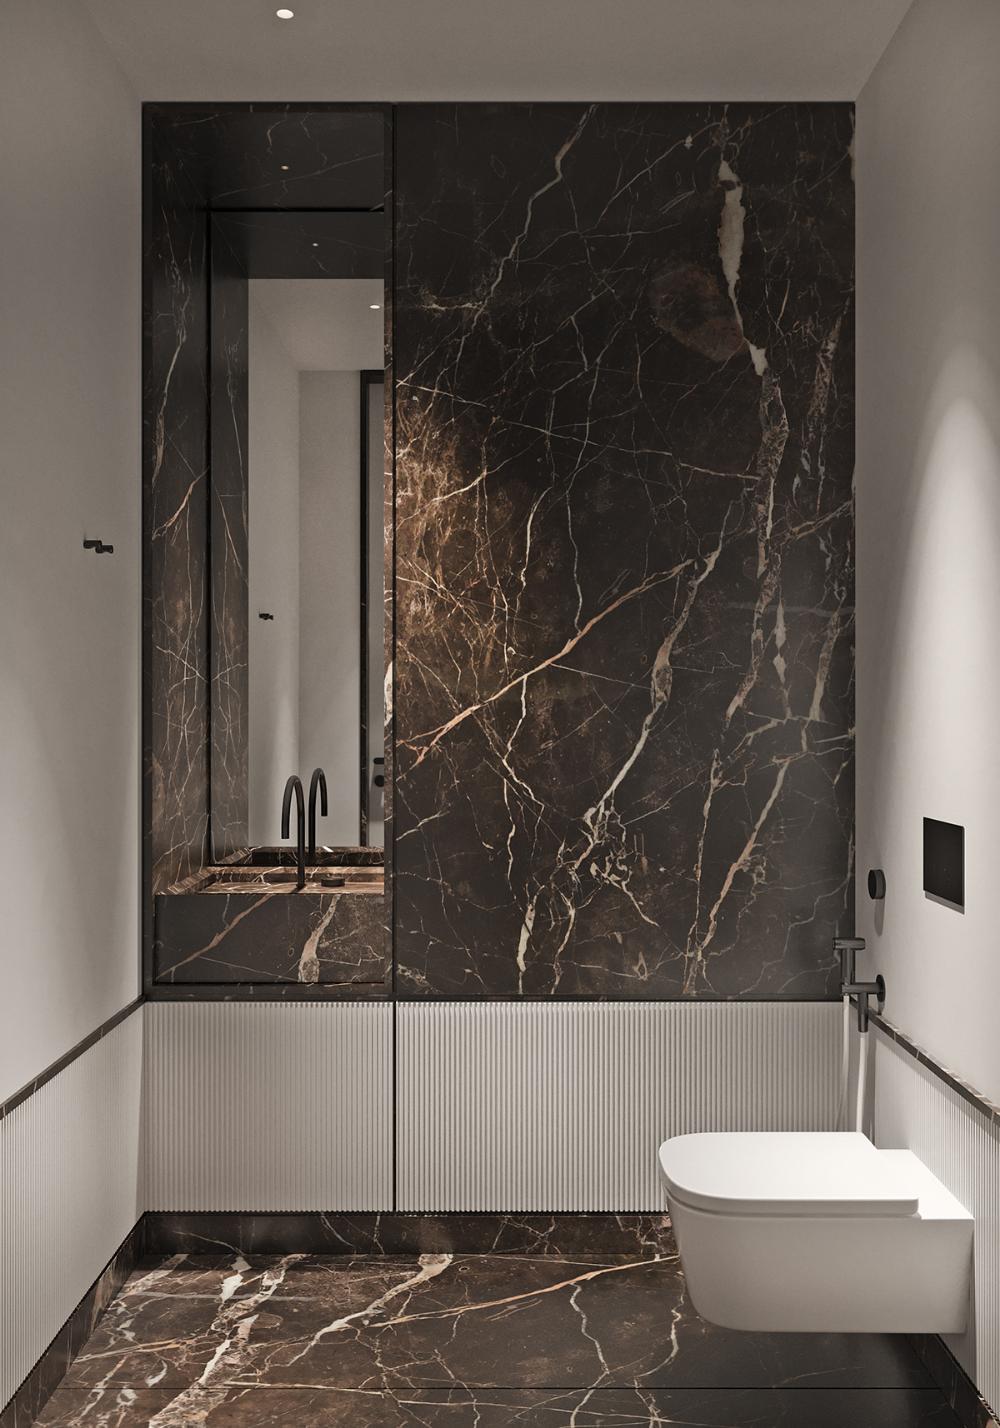 Tol Ko Oats Flat Part 1 On Behance Marble Interior Textured Glass Door Large Bathroom Design